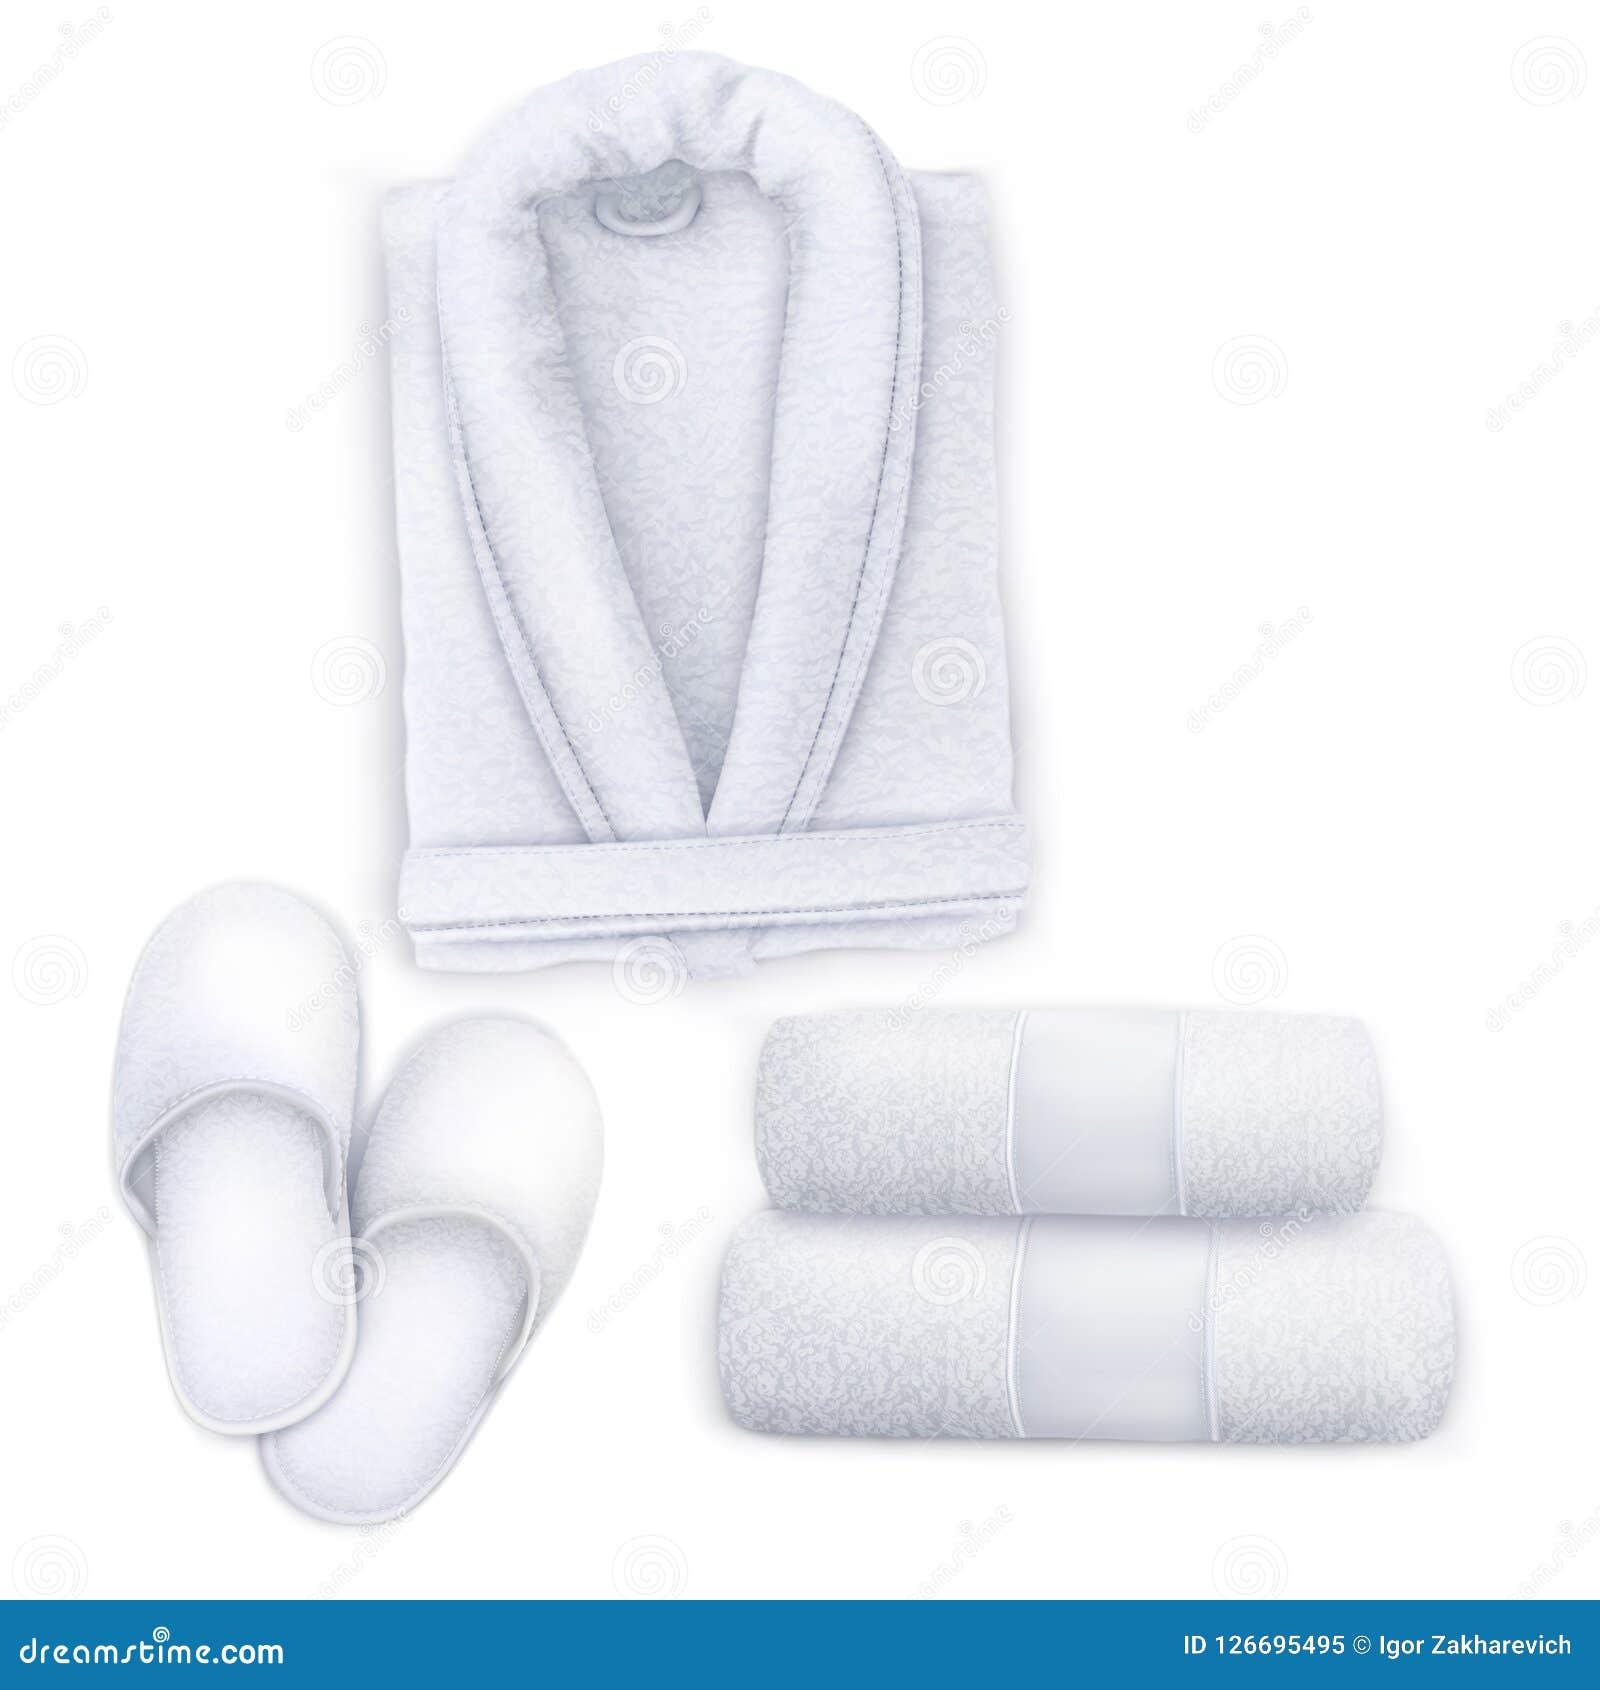 3b8512f5c42df White Set Spa Towel, Slippers, Bathrobe Stock Illustration ...